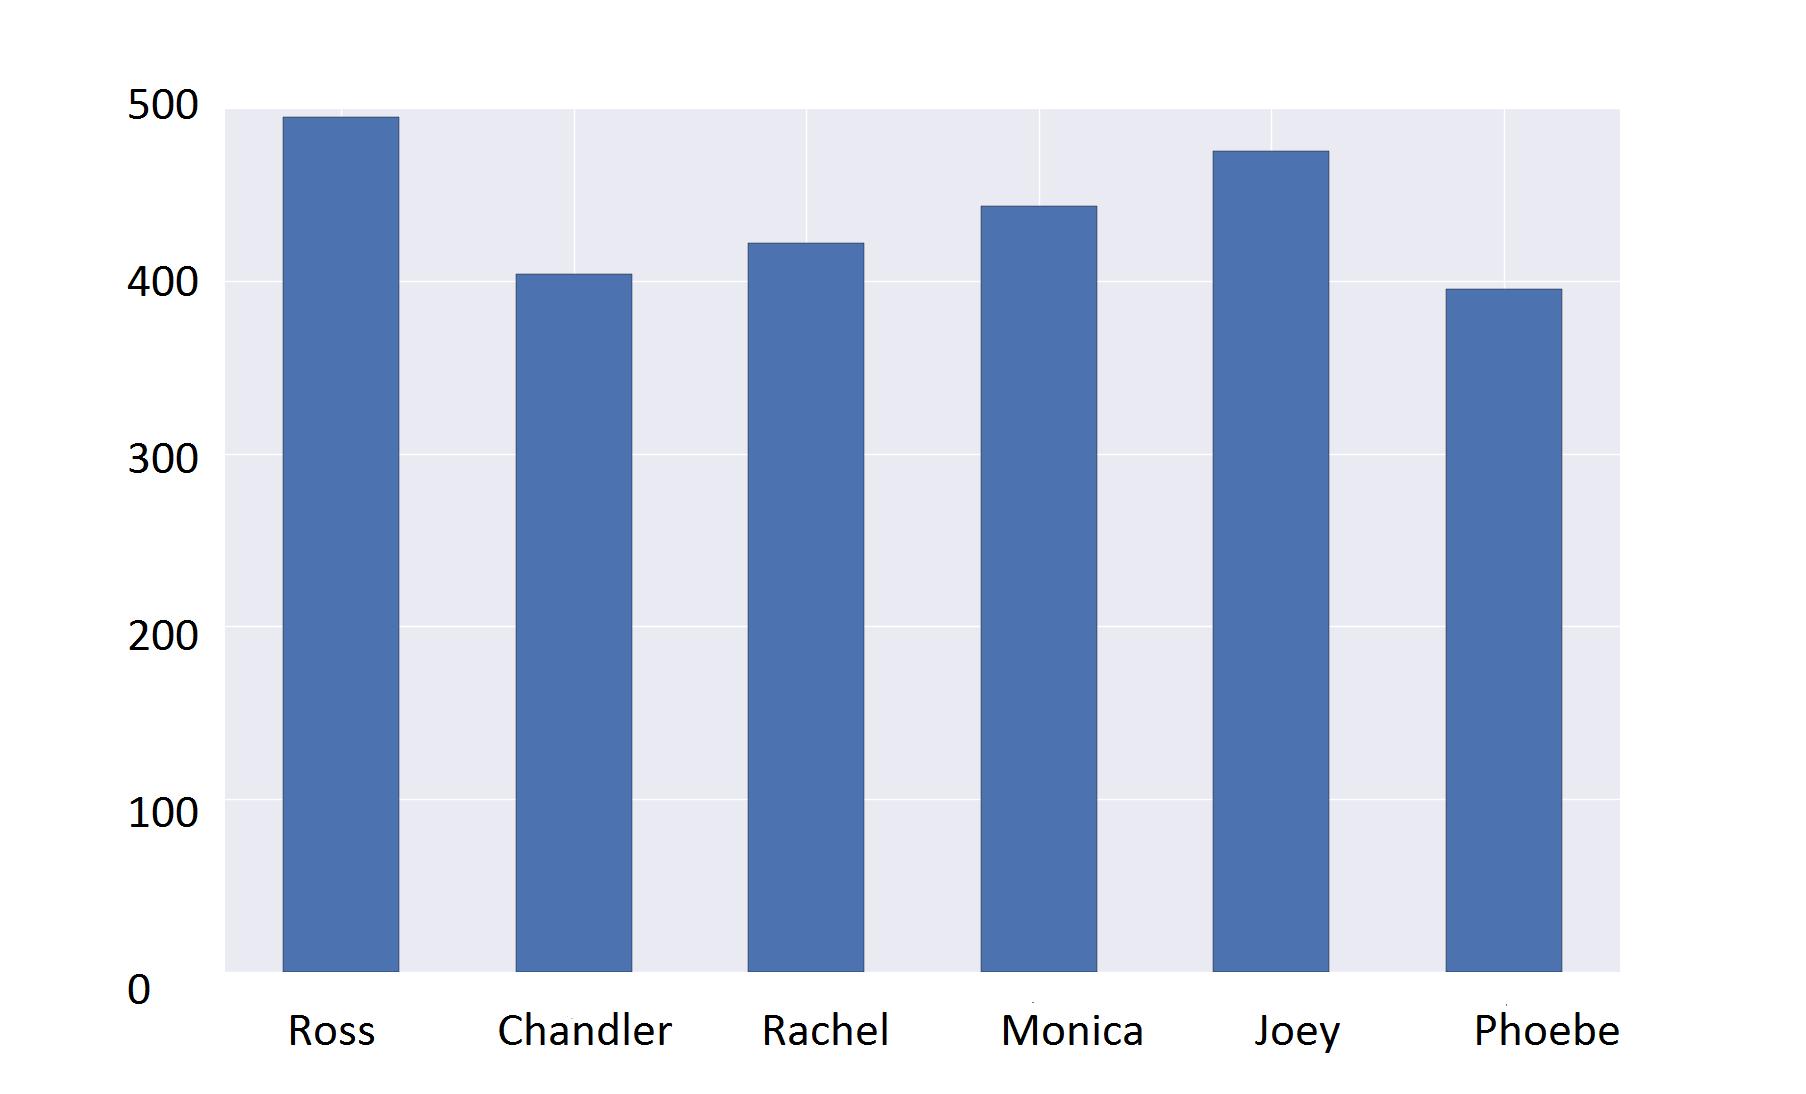 Data Visualization in Python - Pandas